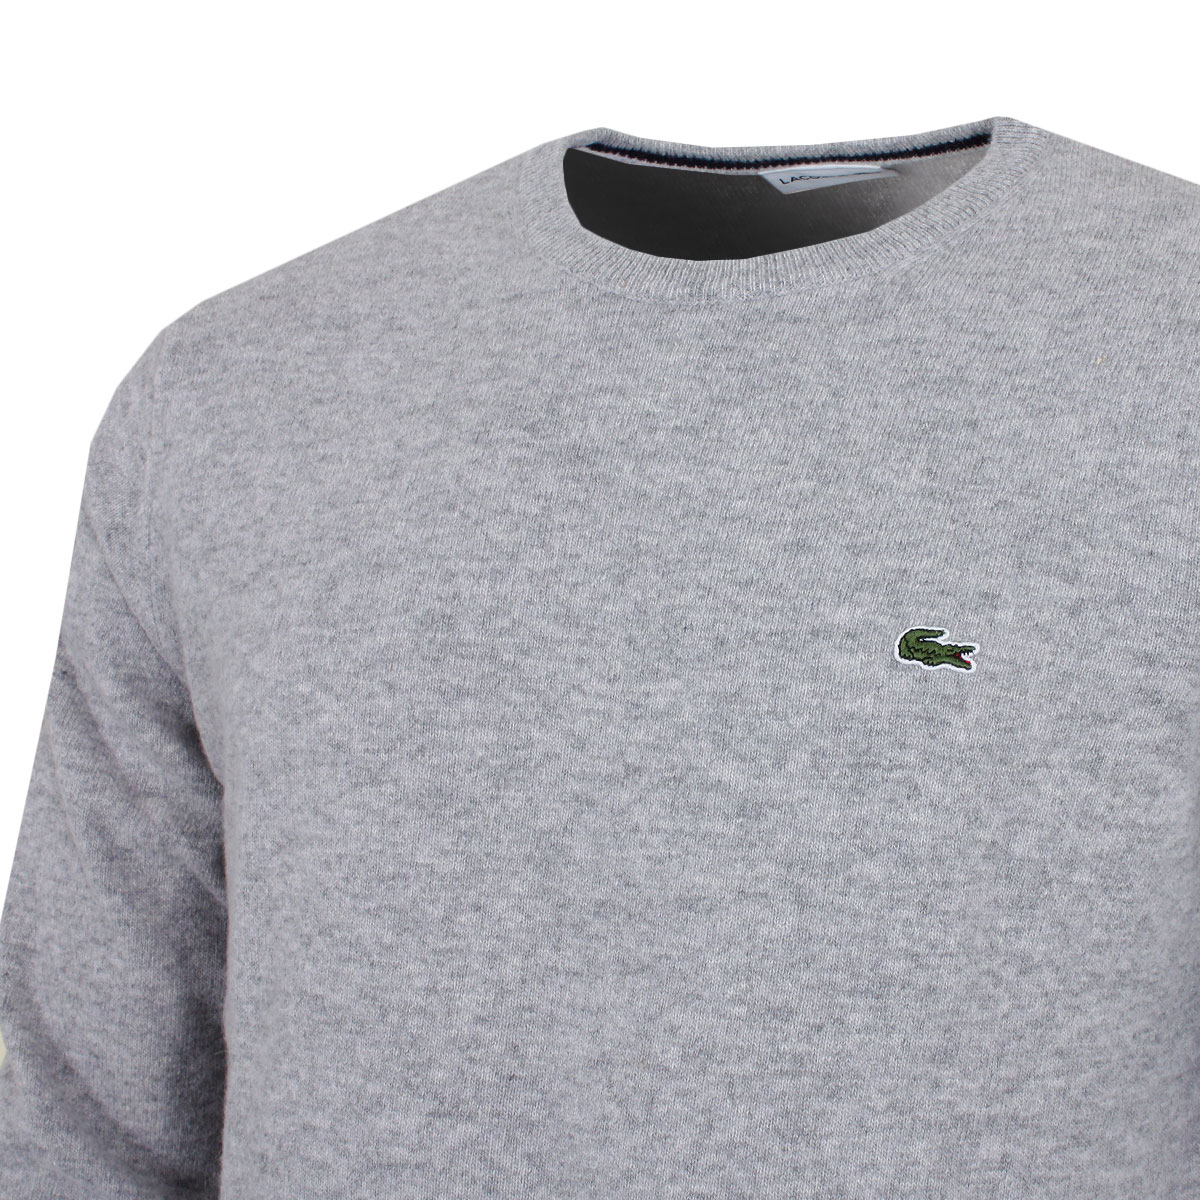 20e5e0779801a Lacoste Mens AH0841 Crew Neck Durable Classic Comfort Wool Jersey ...